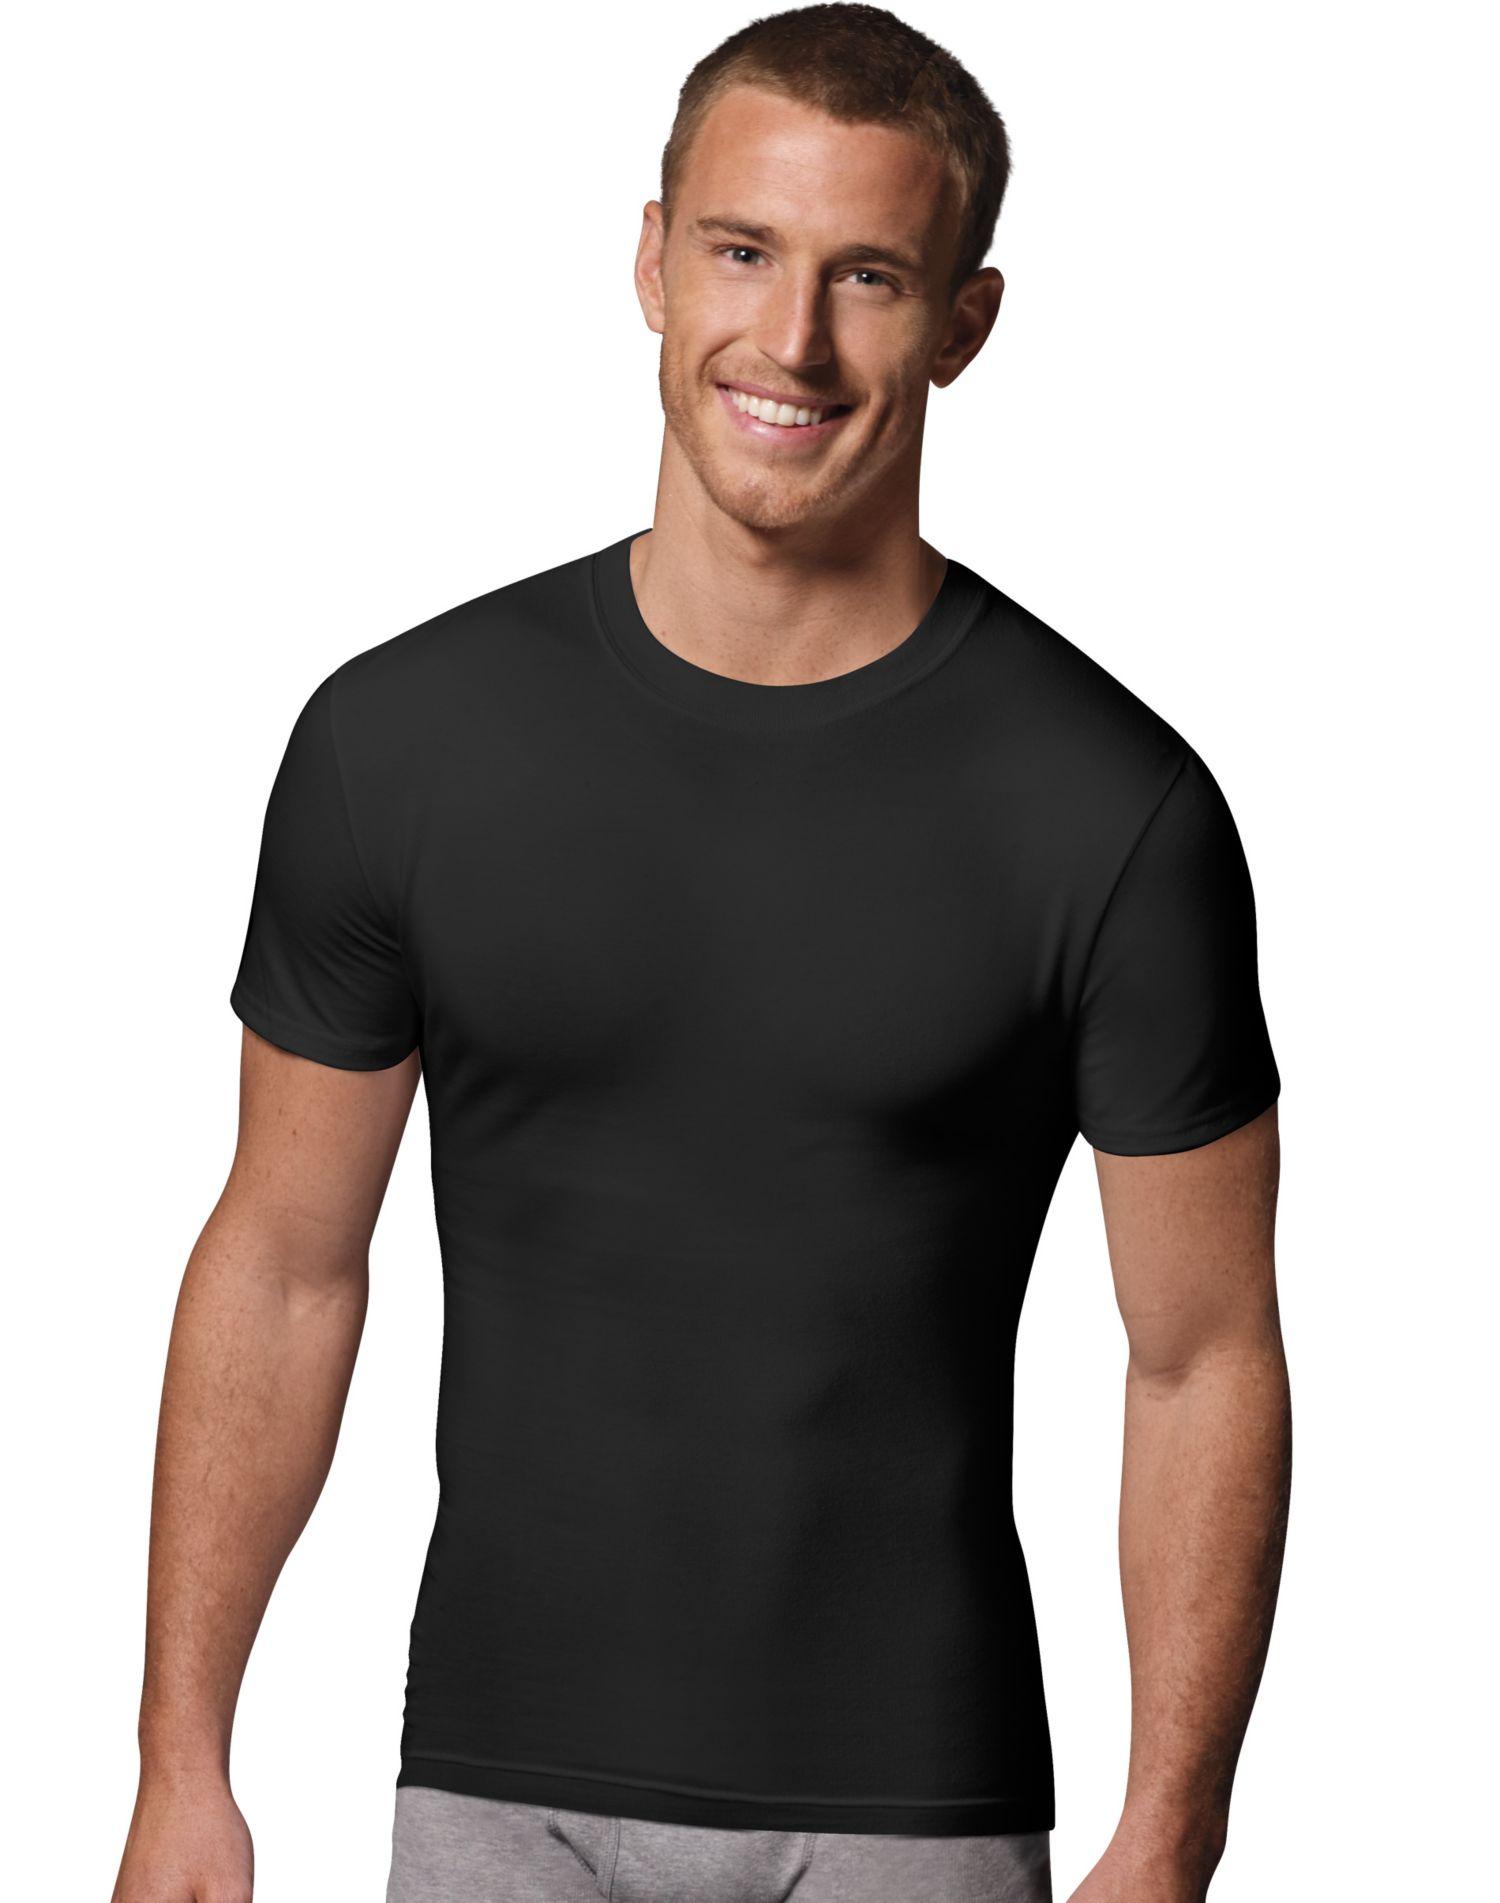 Hanes classics power slim fit white crewneck undershirt 2 pack for Slim fit white t shirt